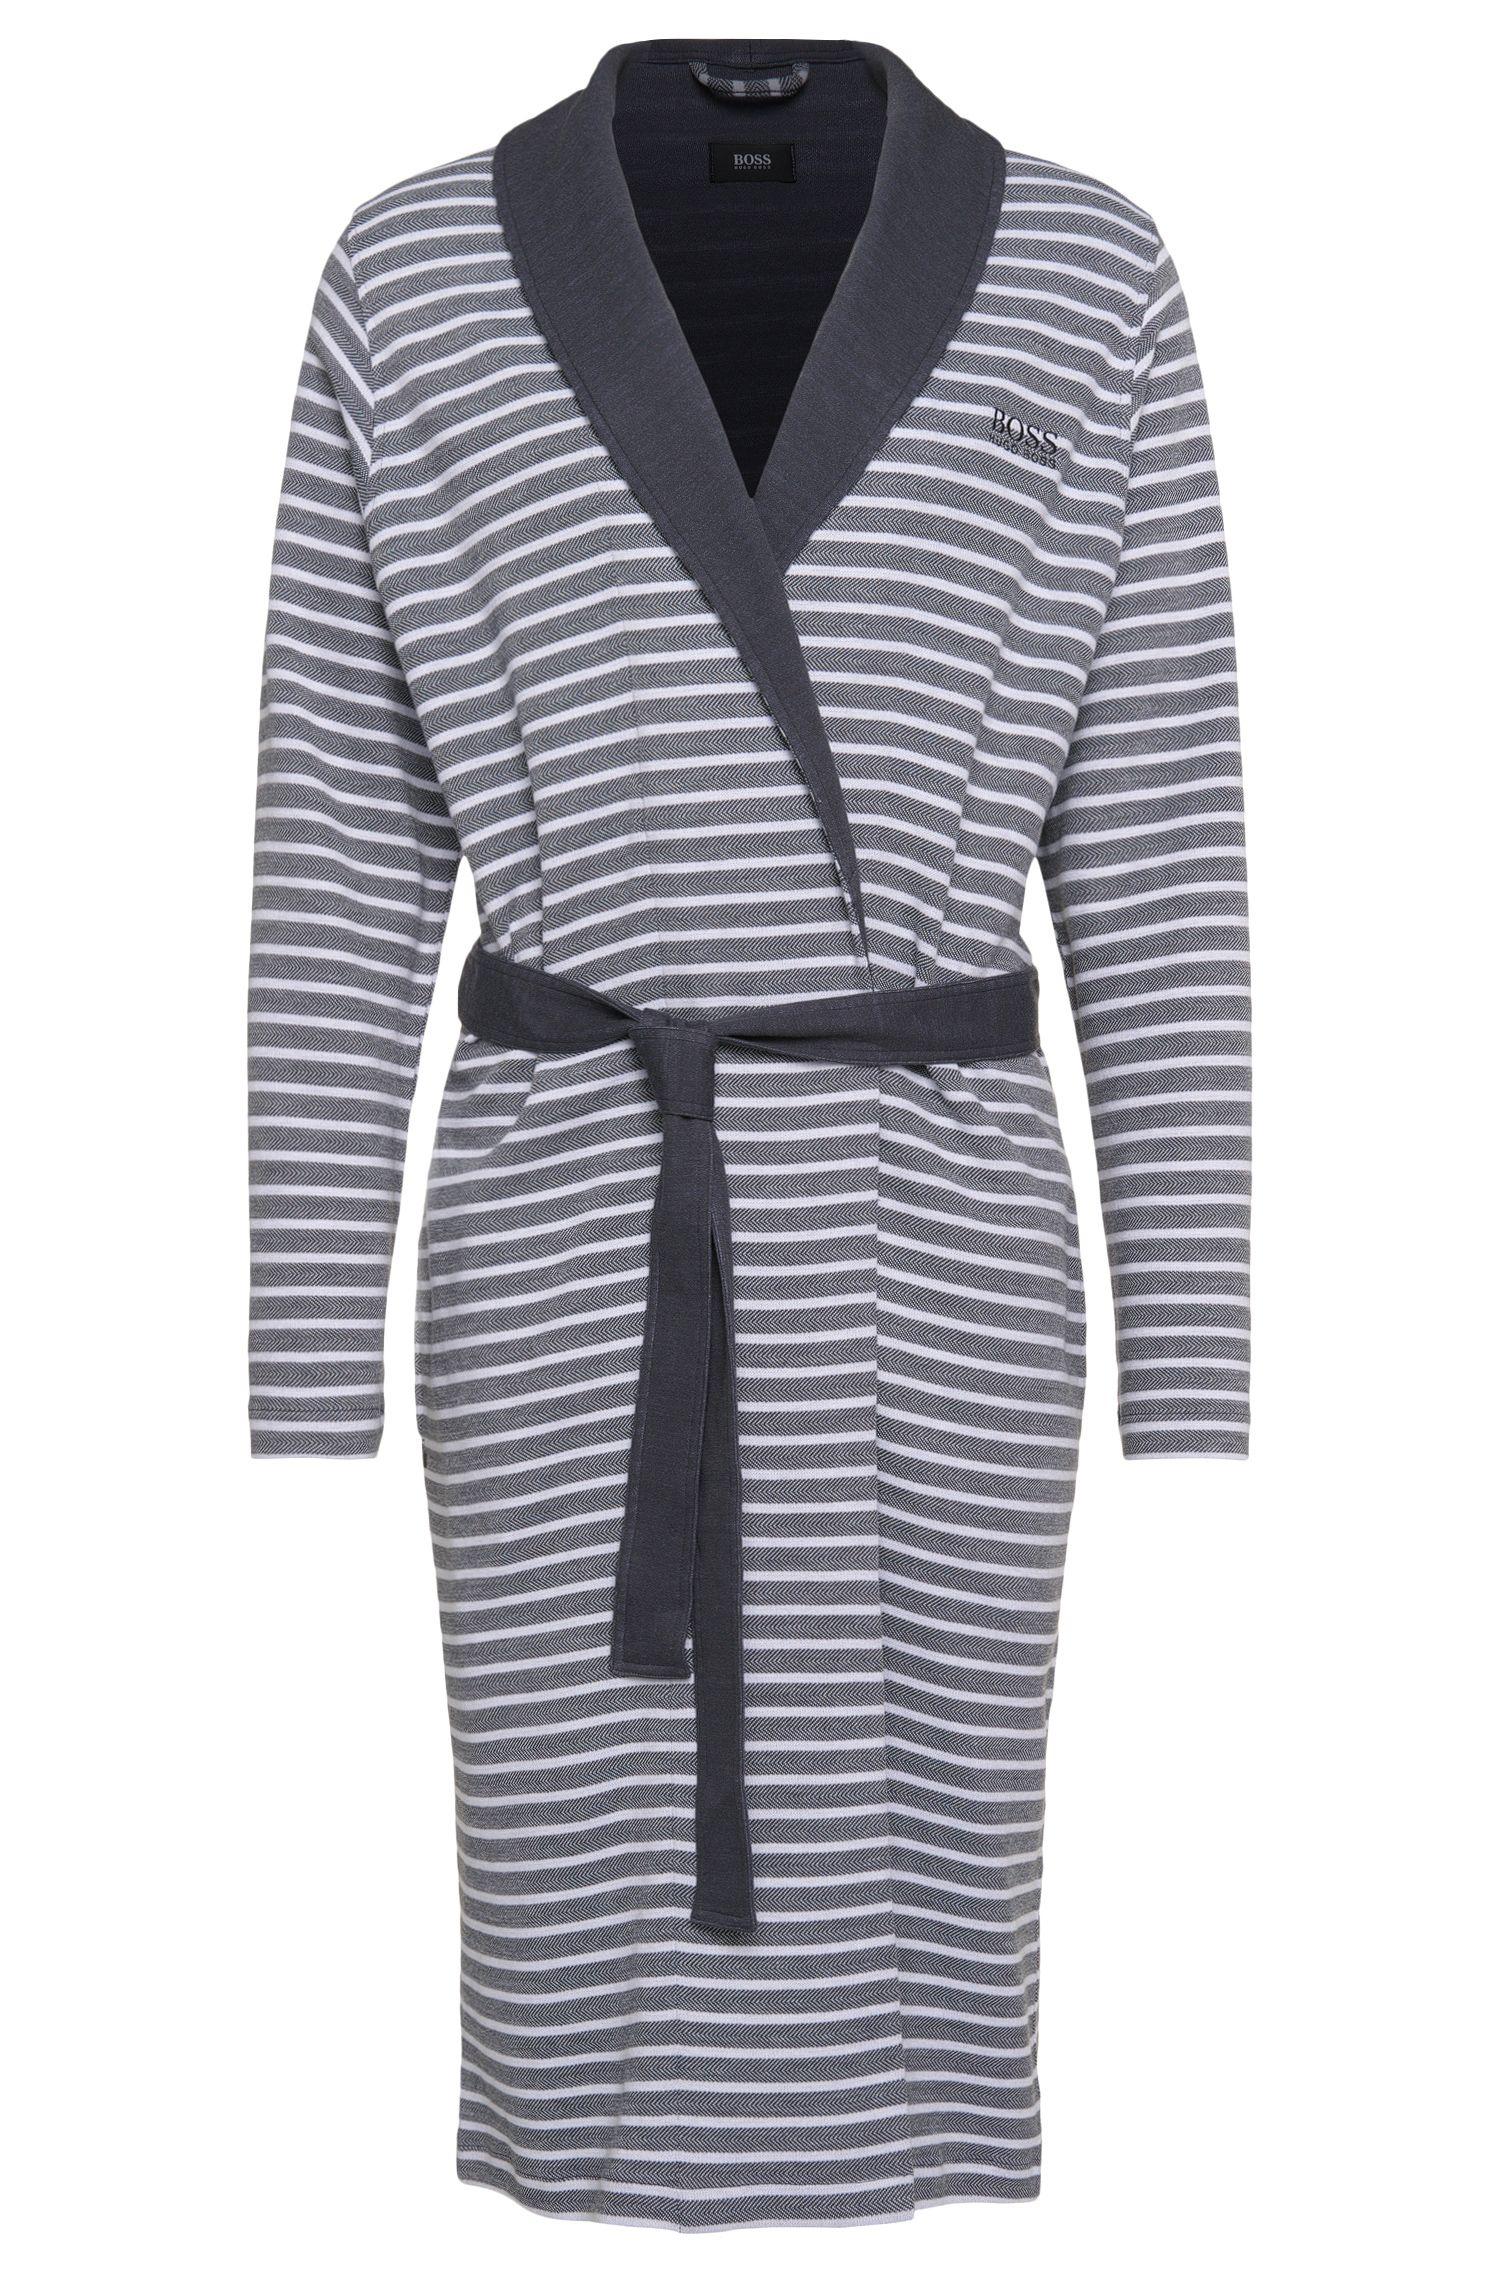 'Shawl Collar Robe' | Cotton Blend Herringbone Striped Robe